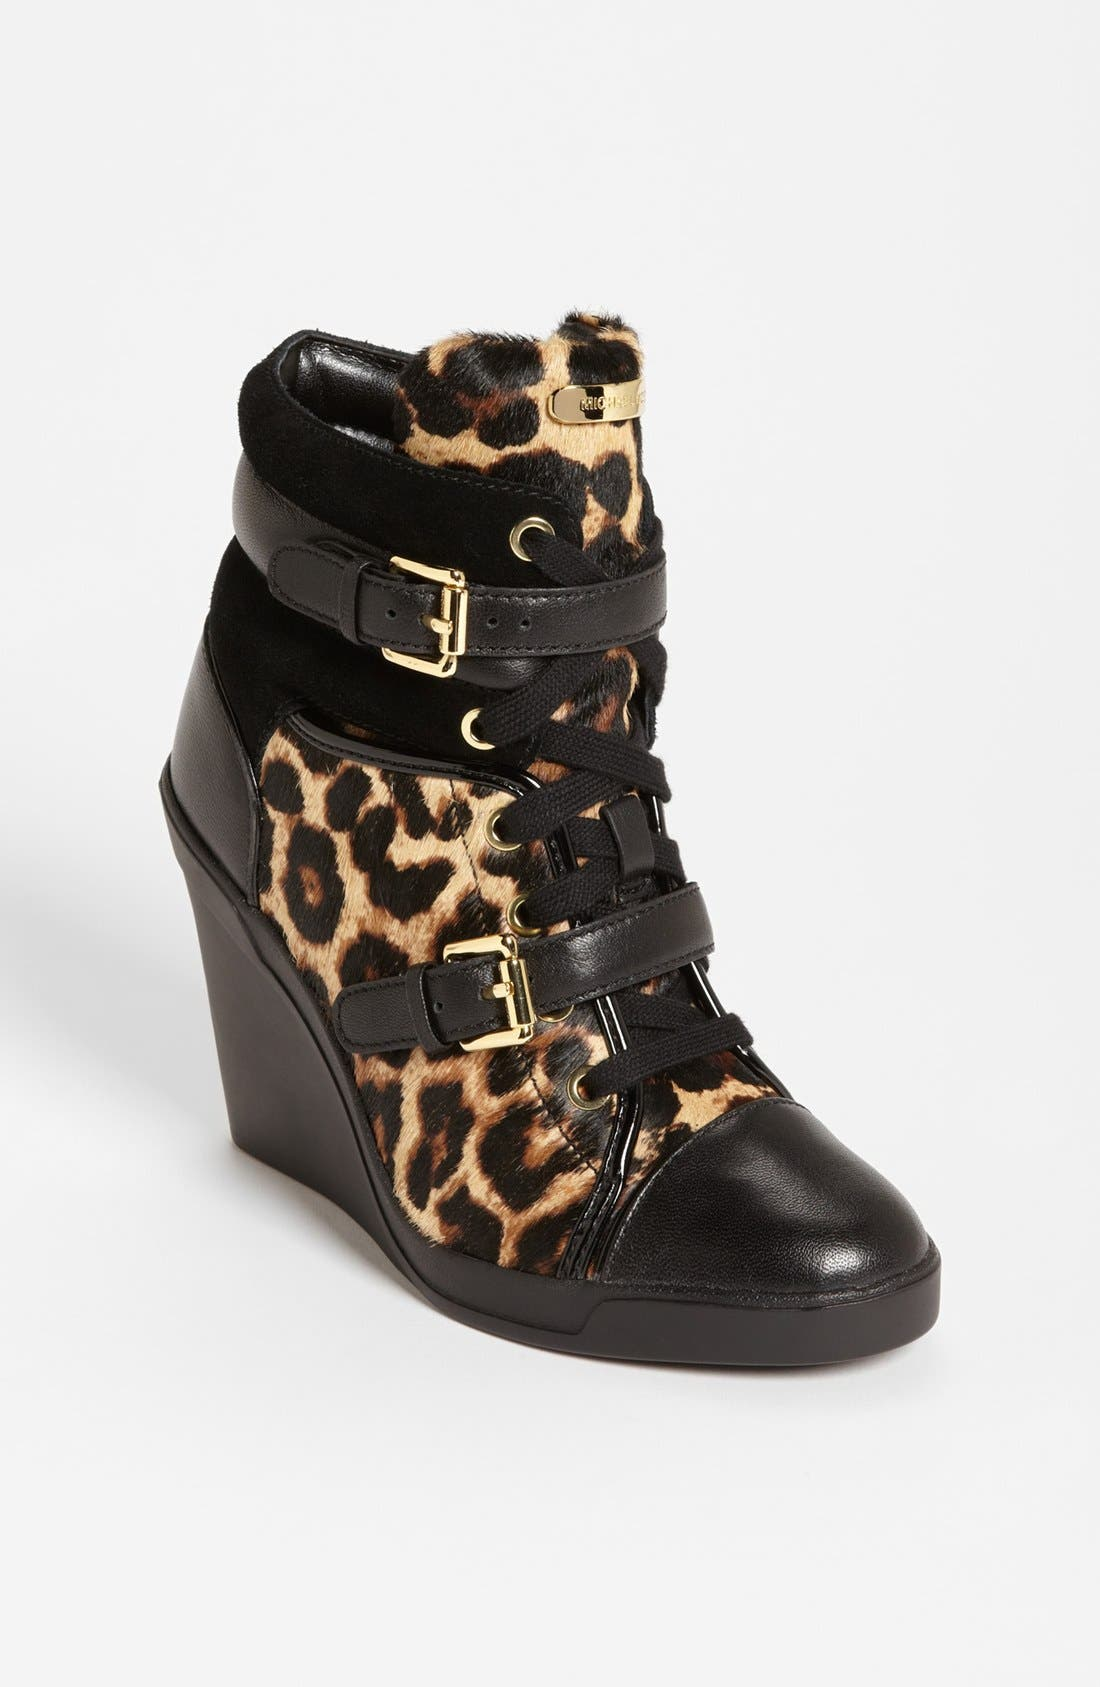 Alternate Image 1 Selected - MICHAEL Michael Kors 'Skid' Wedge Sneaker